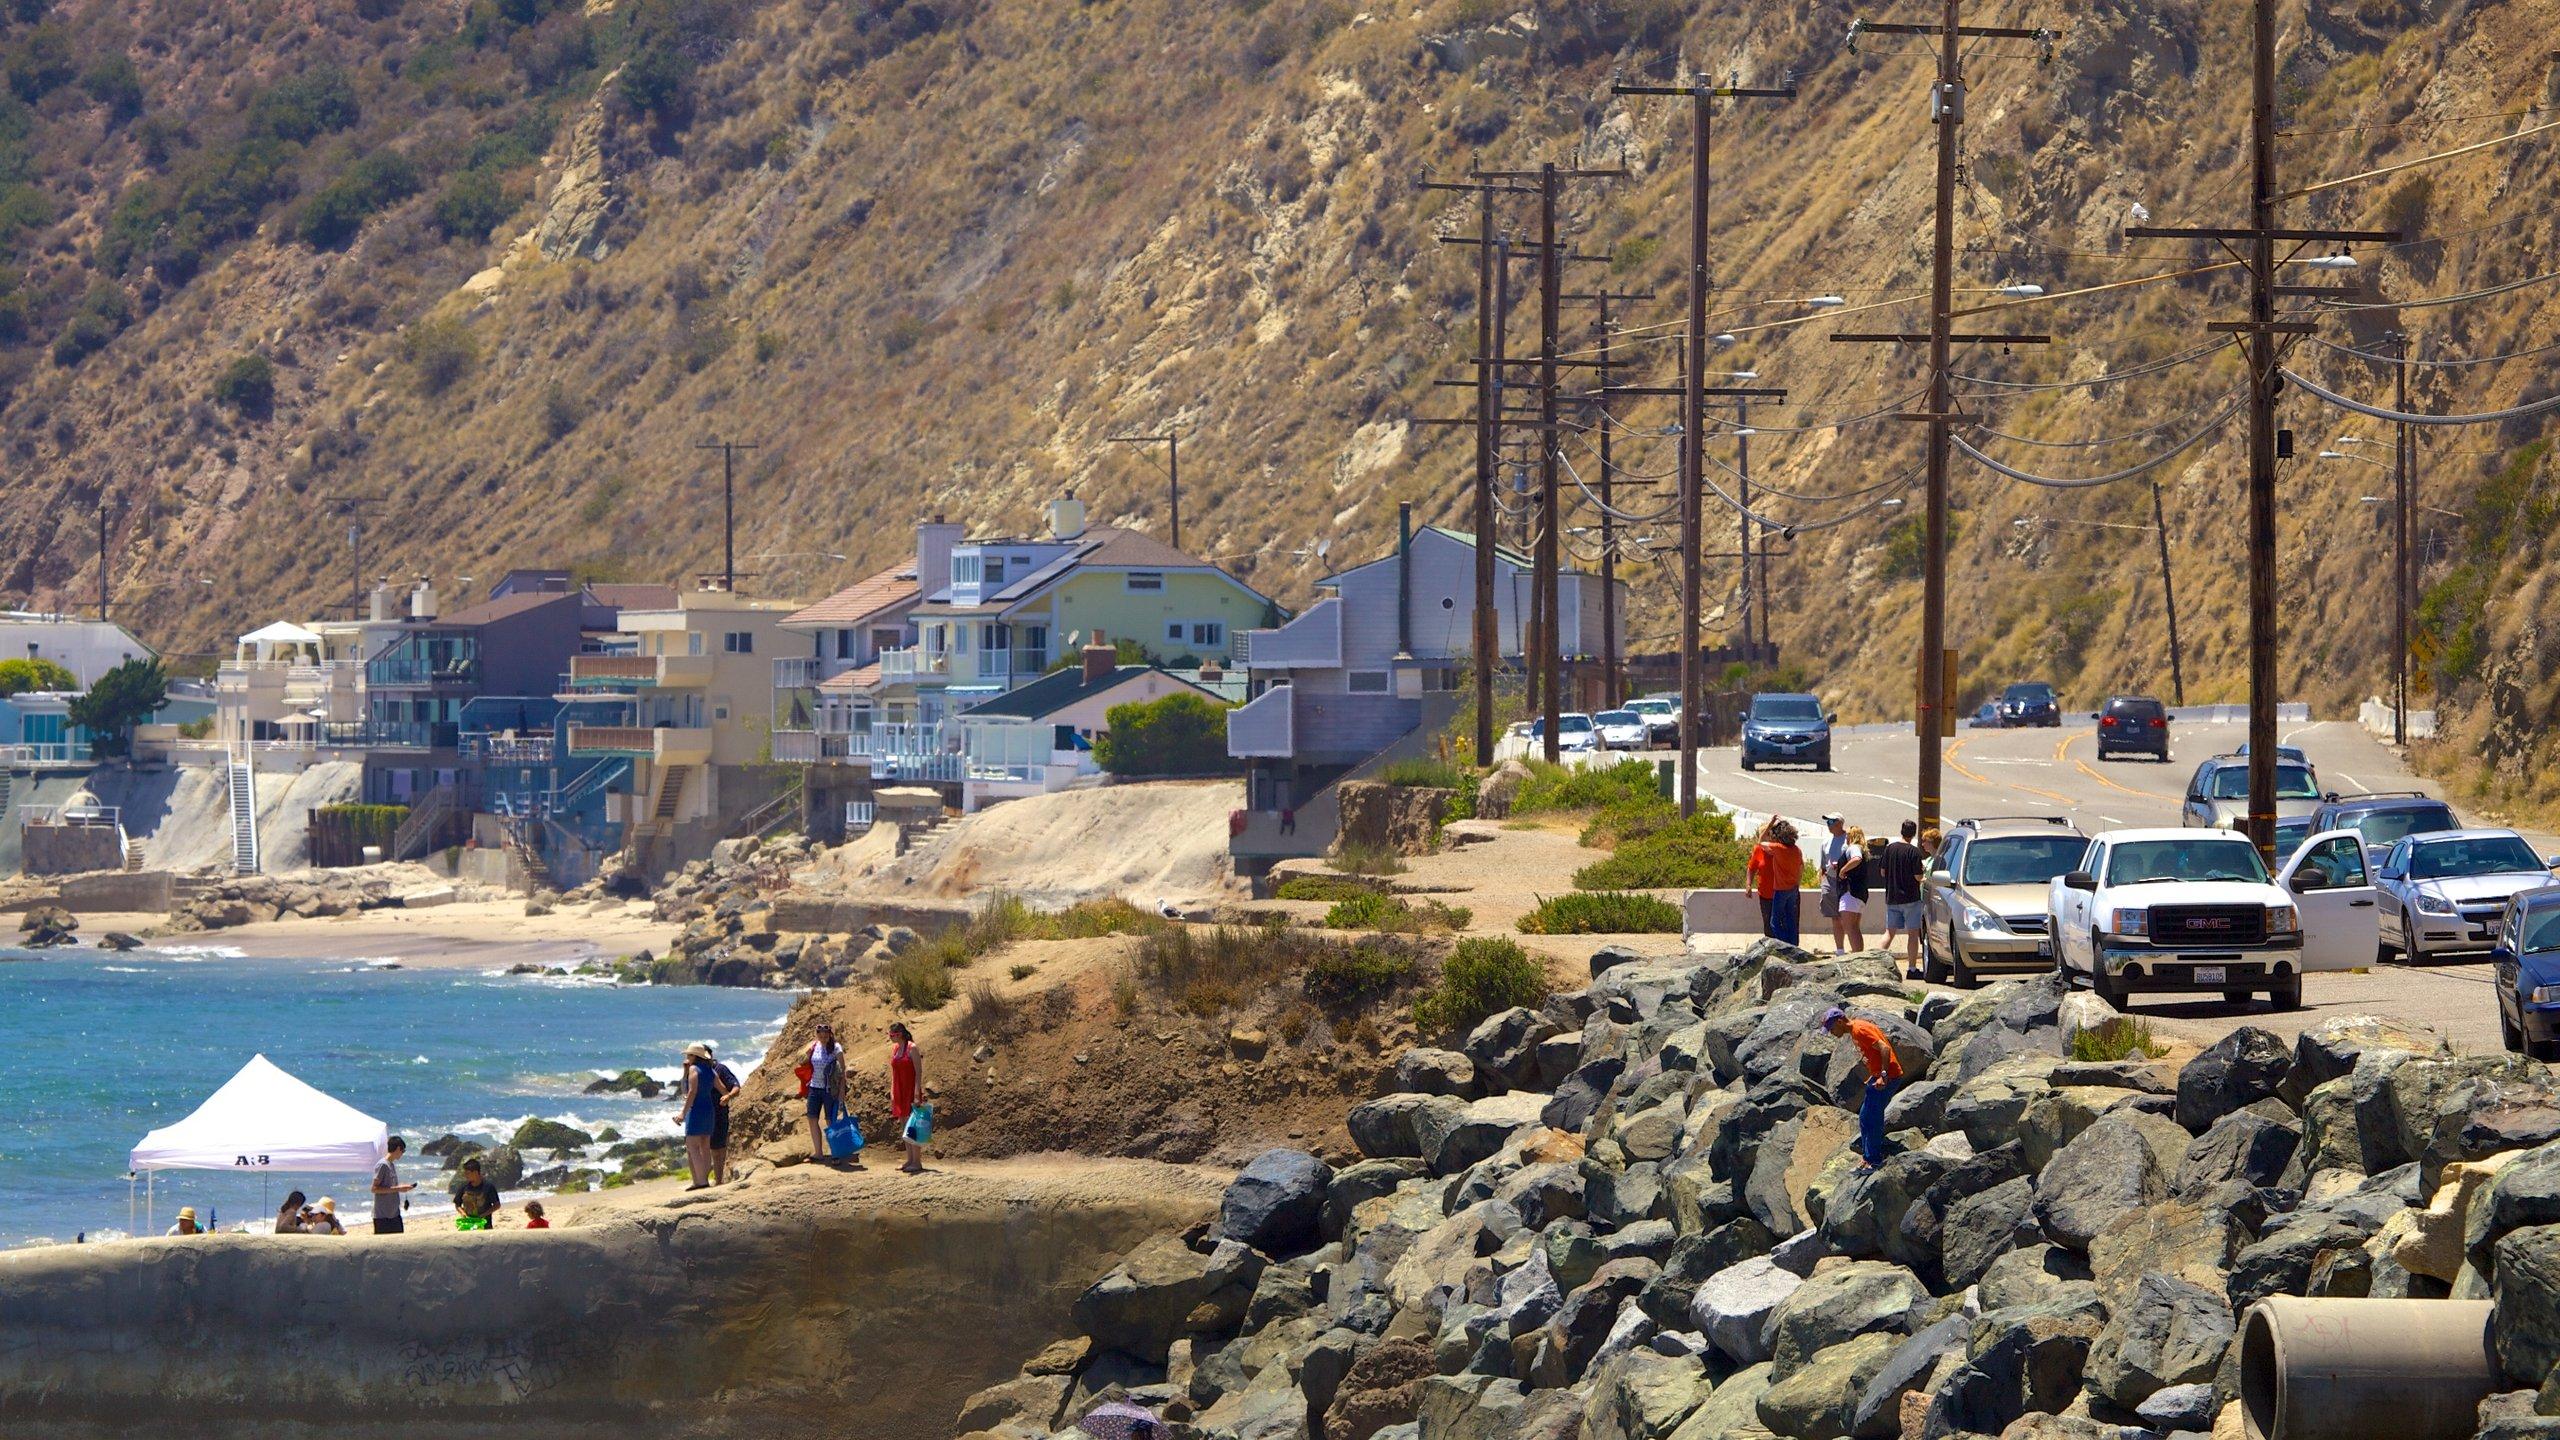 Eastern Malibu, Malibu, California, United States of America